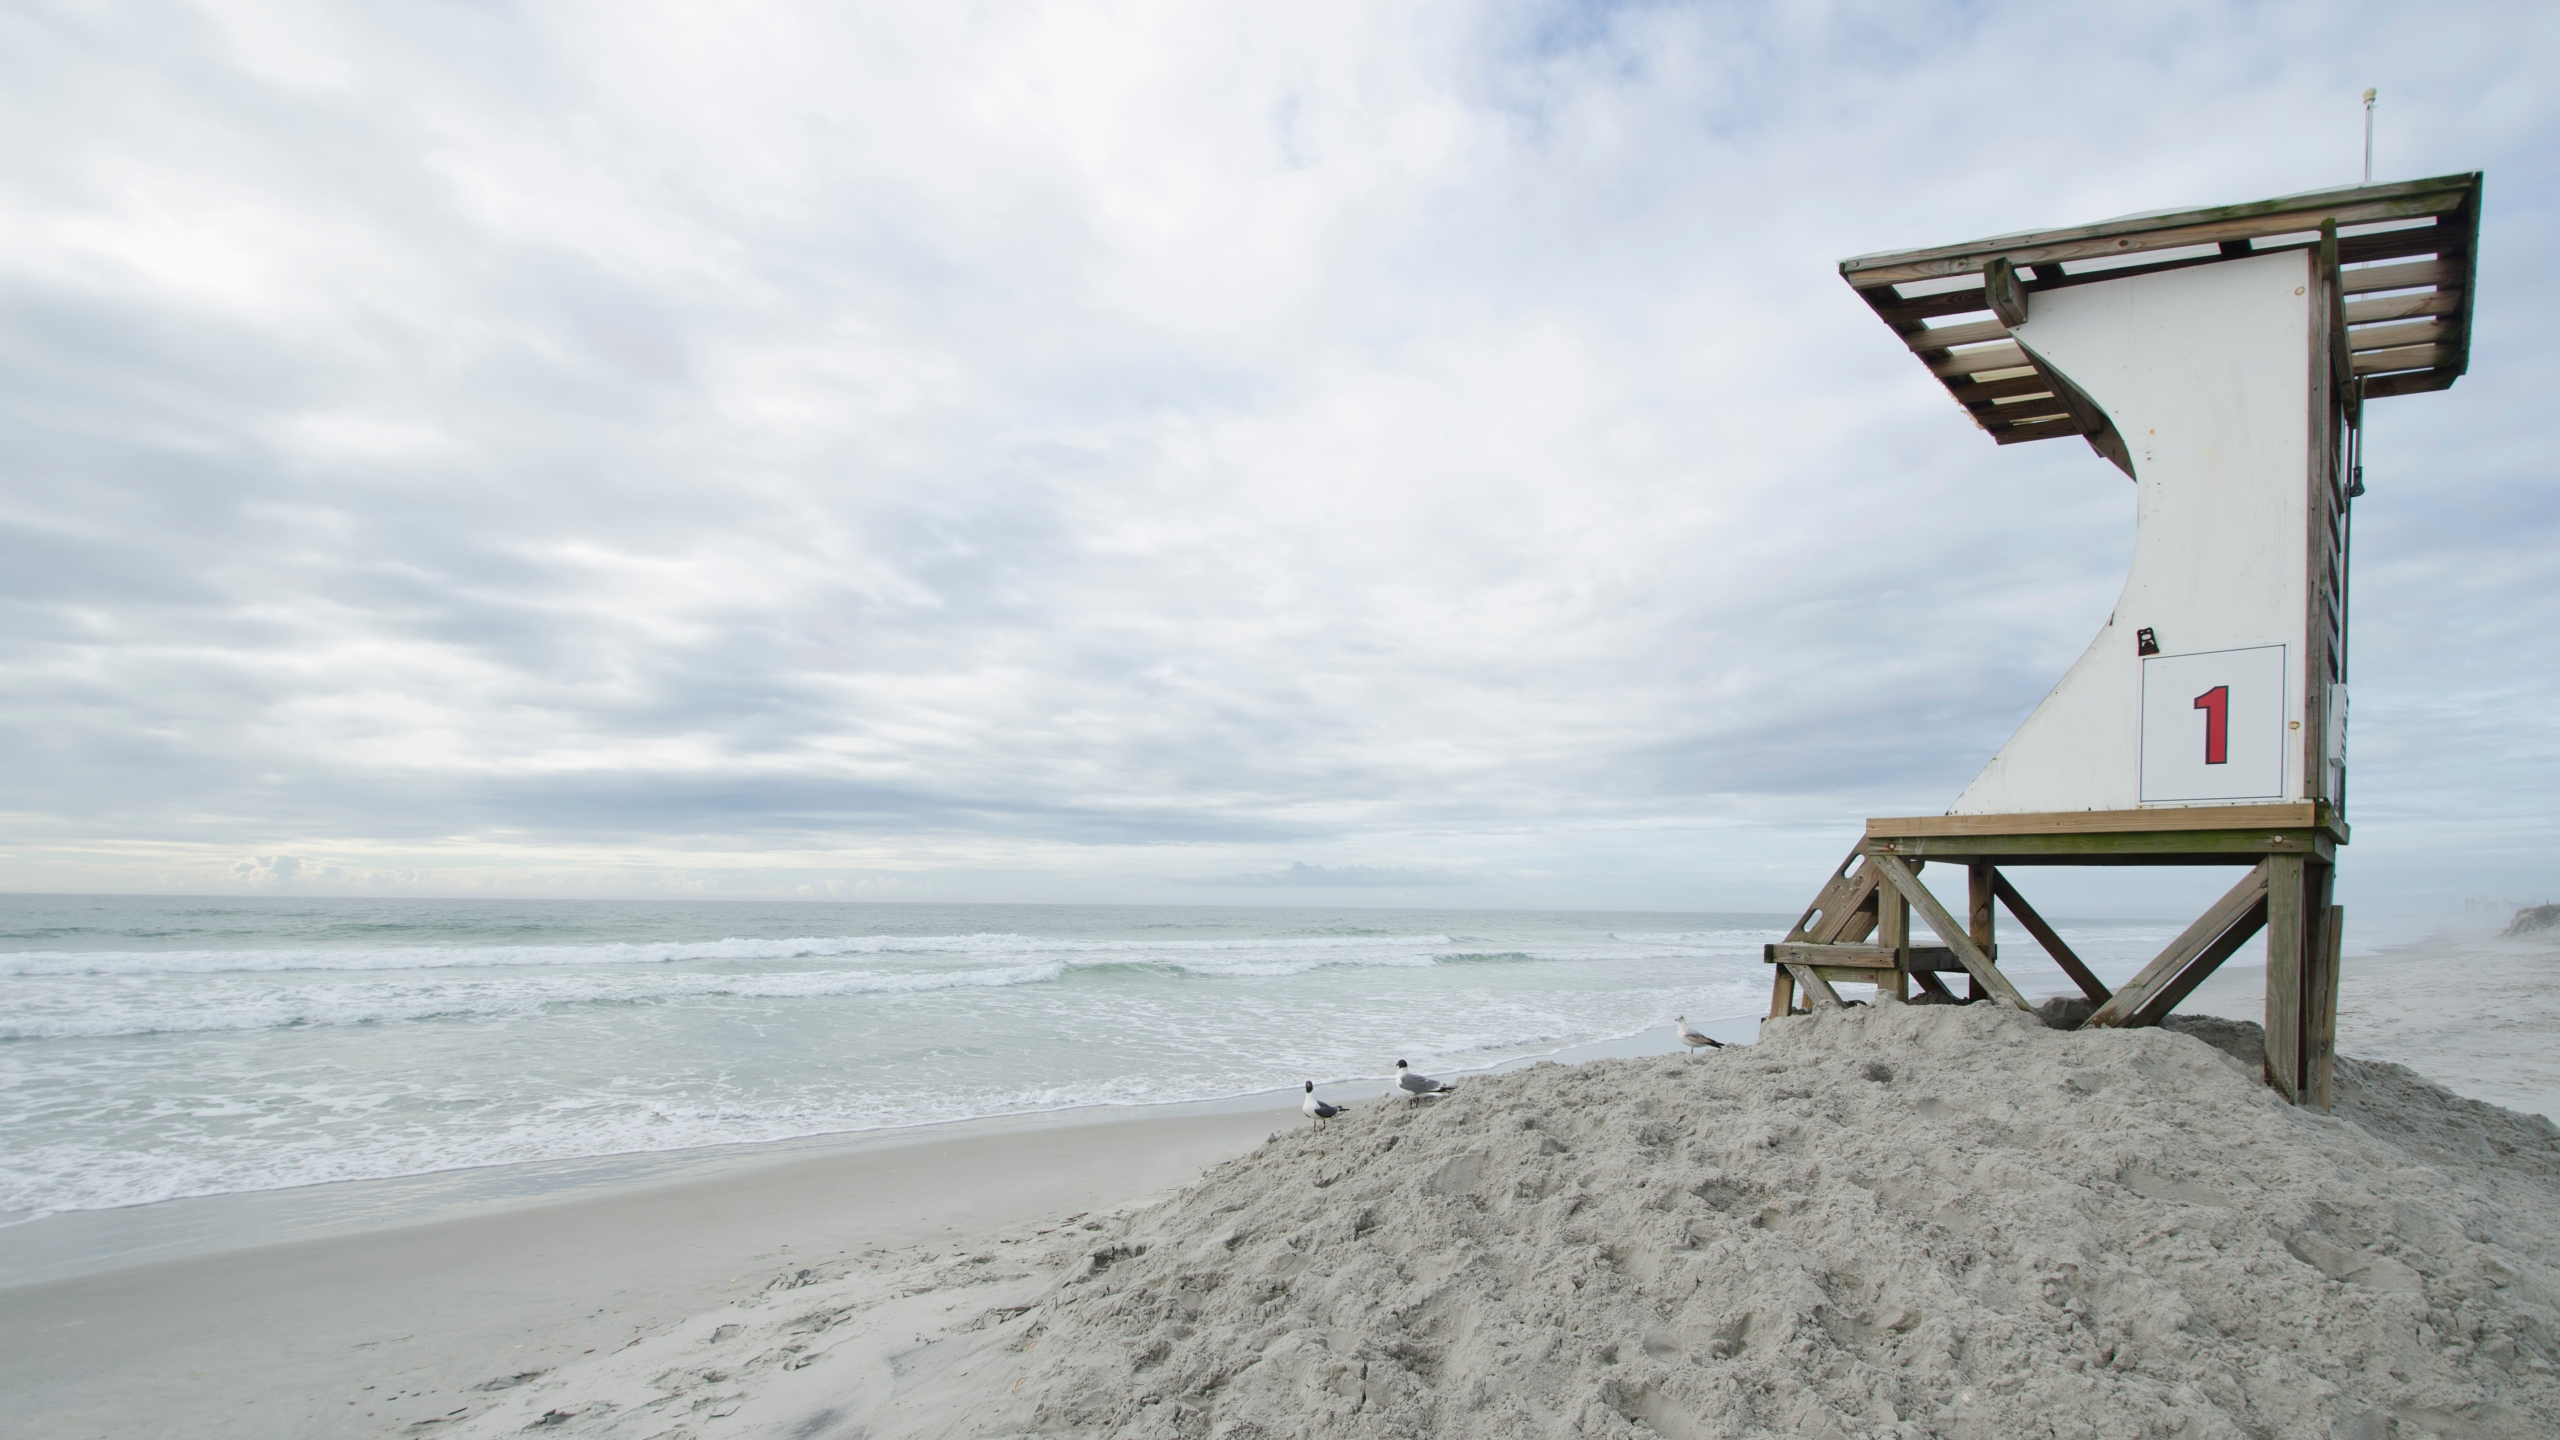 Wrightsville Beach (Stock image/Getty)